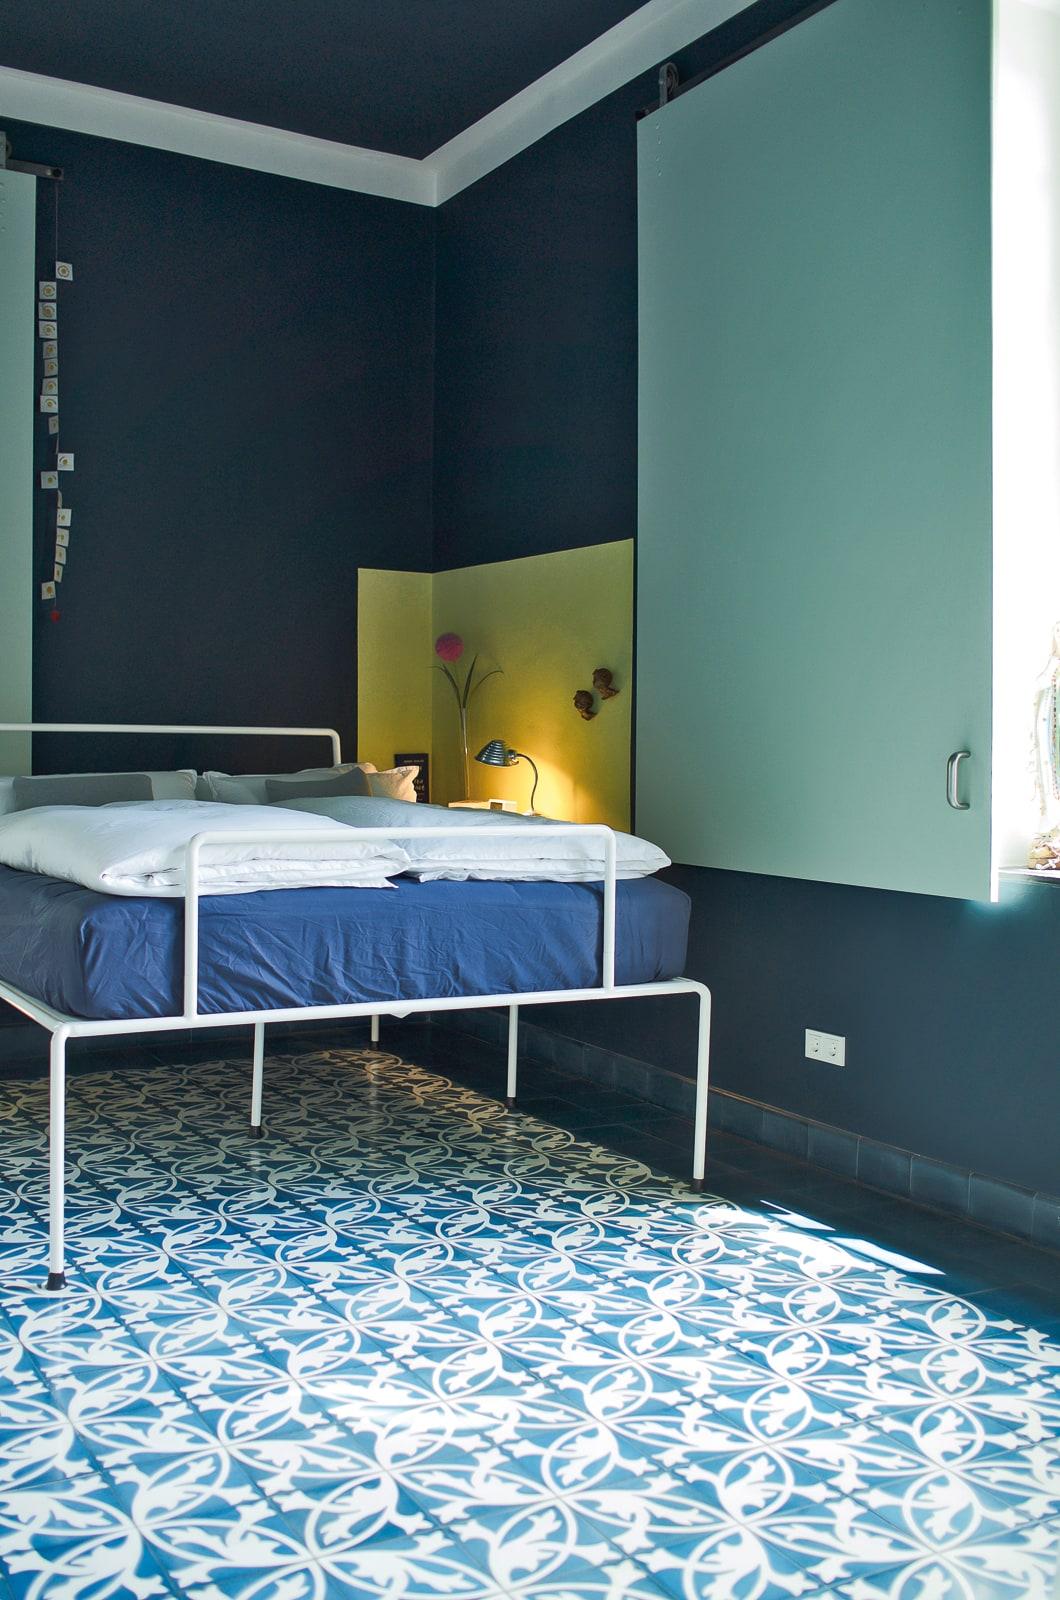 zementfliesen-terrazzofliesen-kreidefarbe-damastgruen-terrazzo-fugenlos-viaplatten-schlafzimmer-02 | Kreidefarbe Damastgrün 60 ml